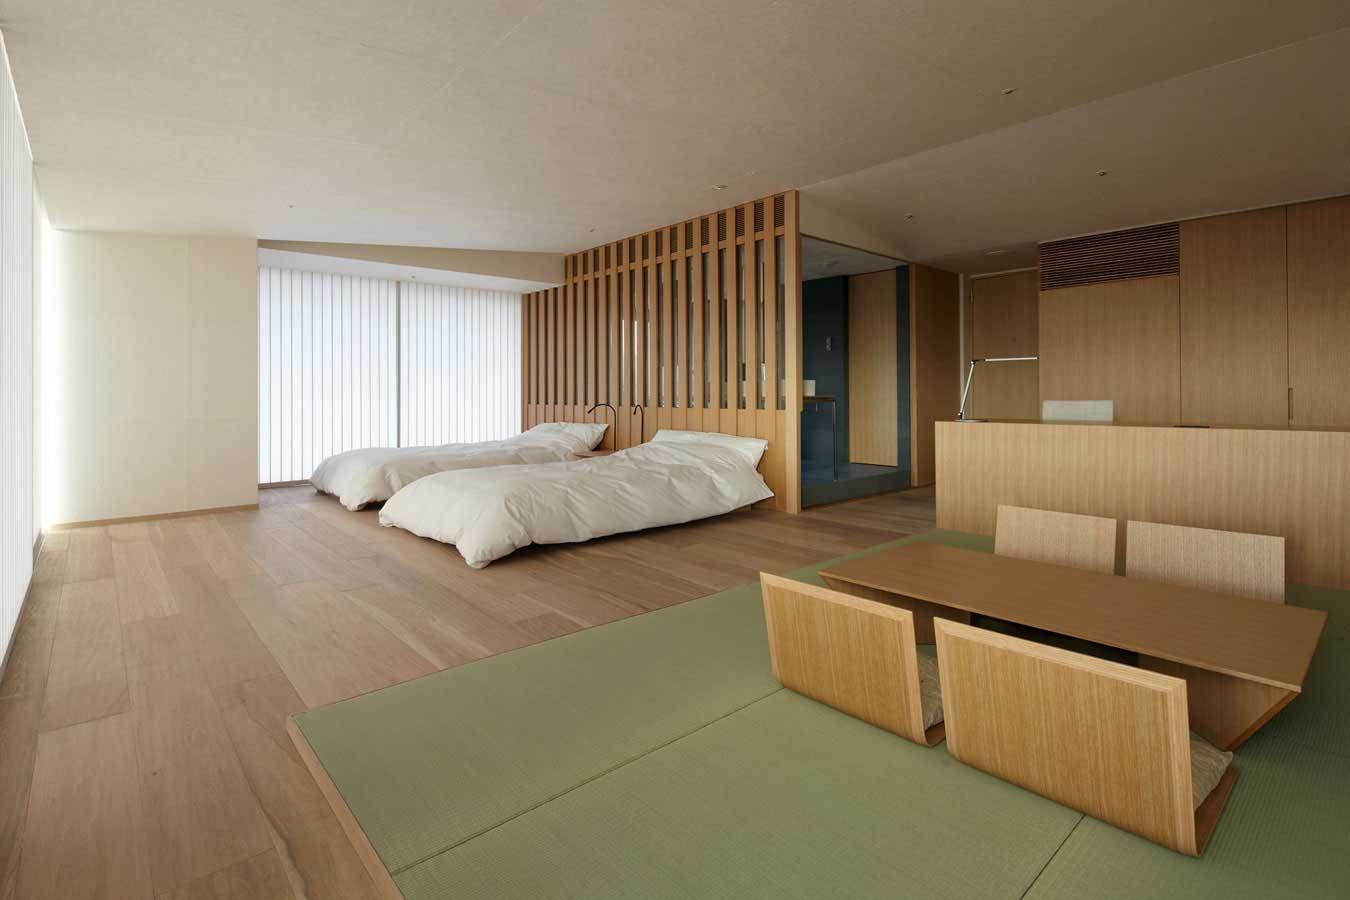 Best 21 Beautiful Wooden Bed Interior Design Ideas Modern 400 x 300